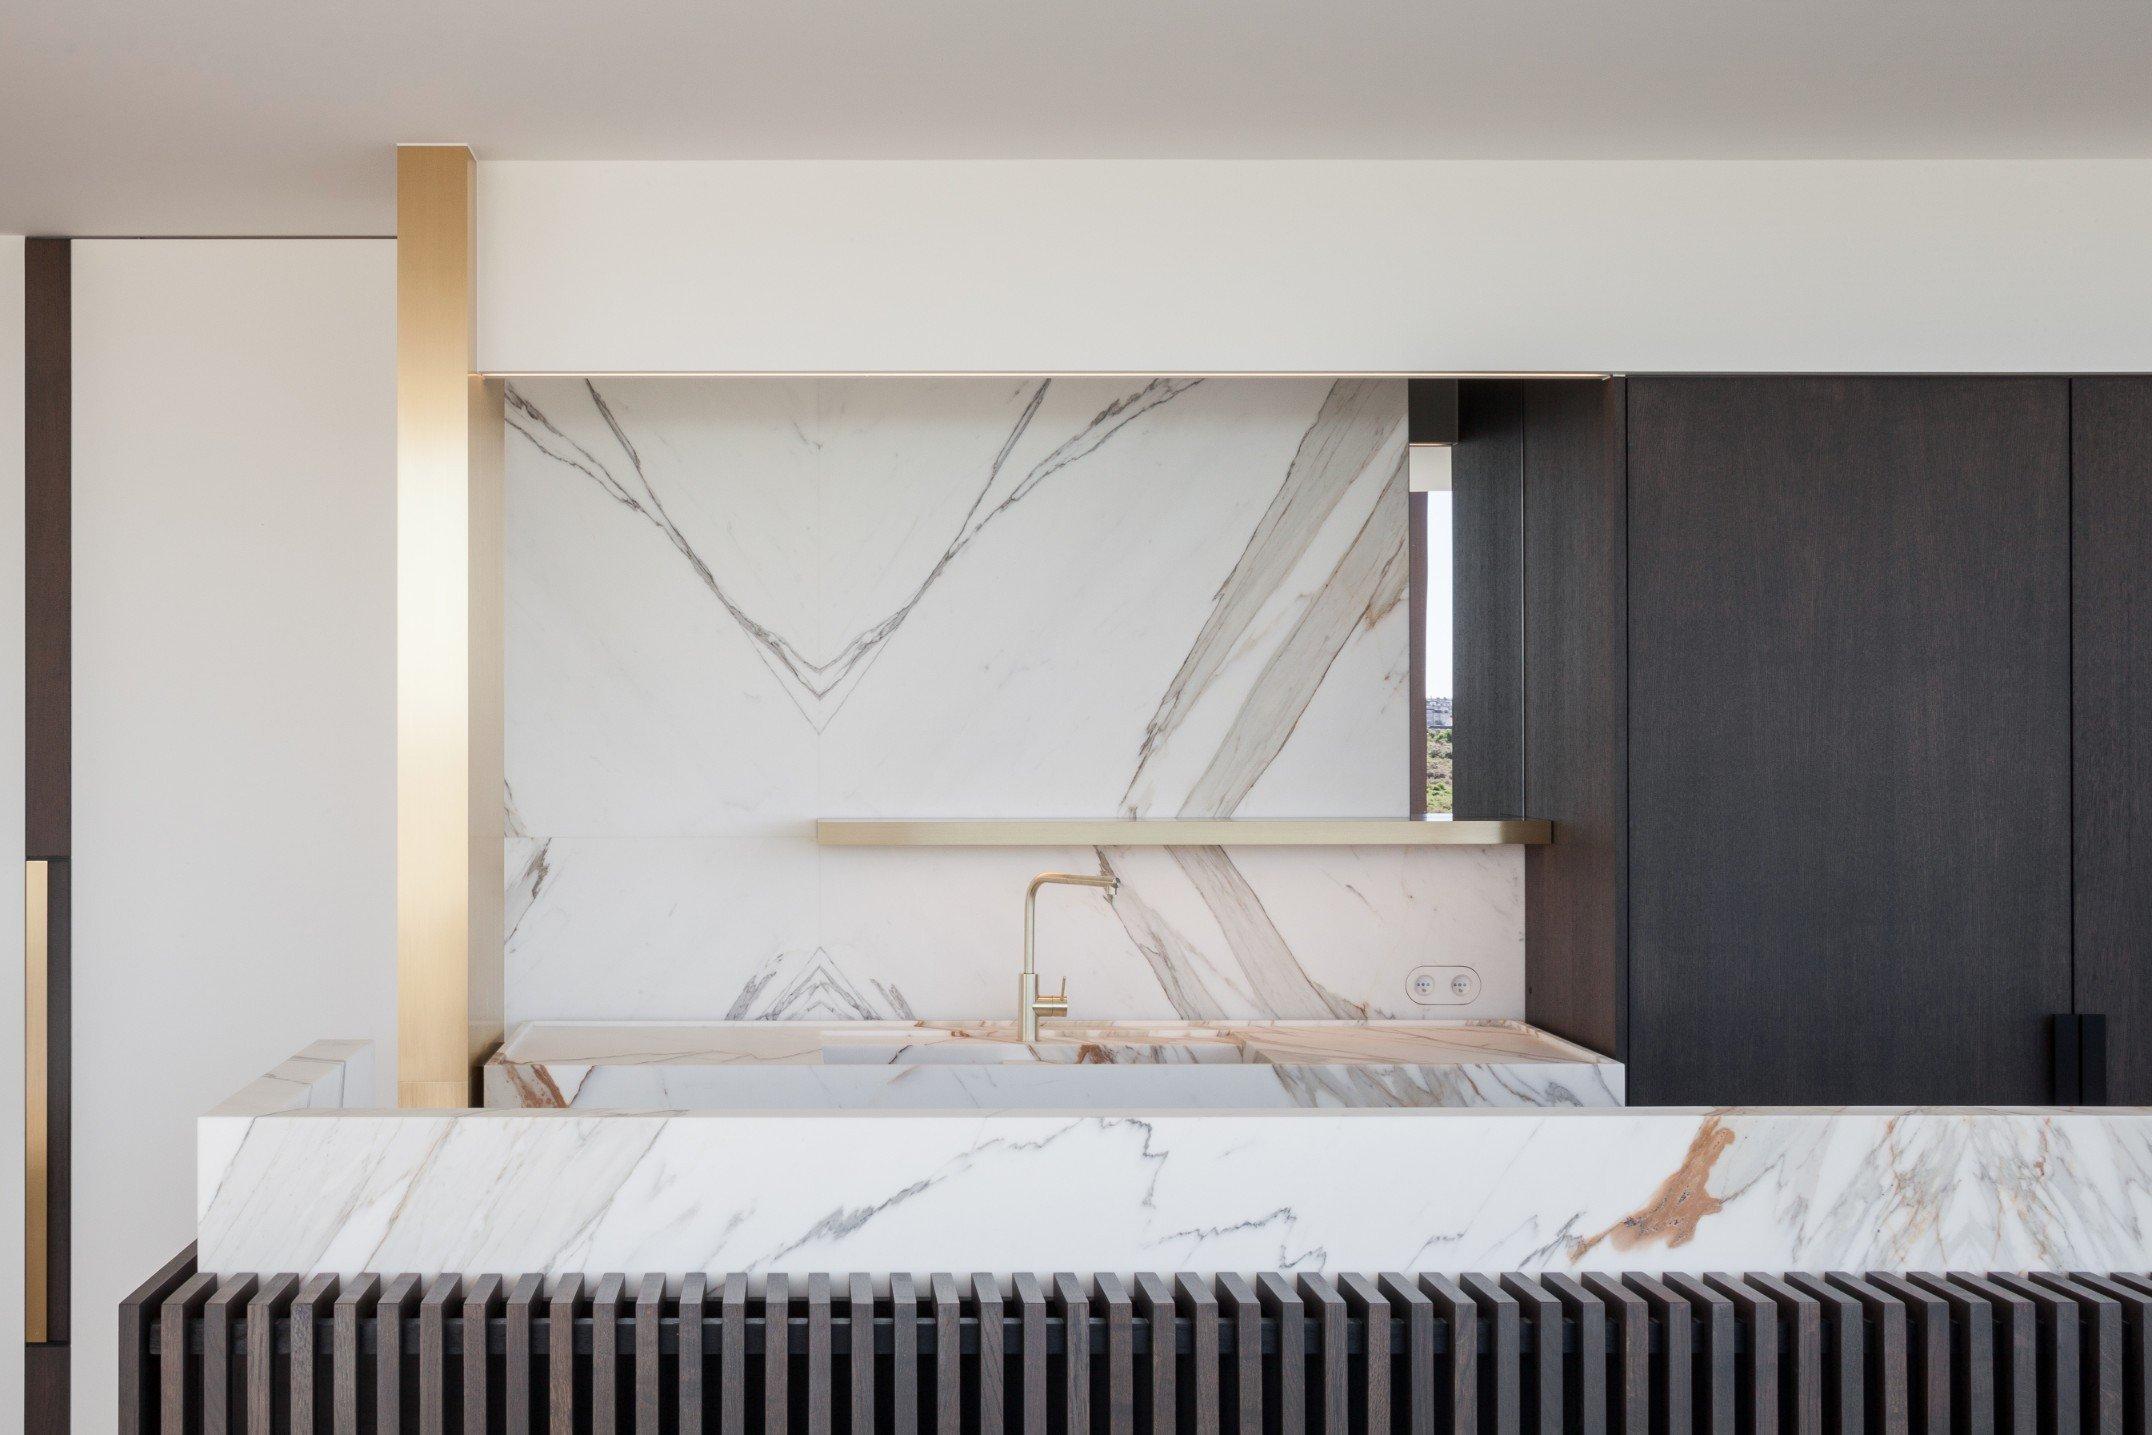 Rietveldprojects-penthouse-appartement-design-architectuur-kust26